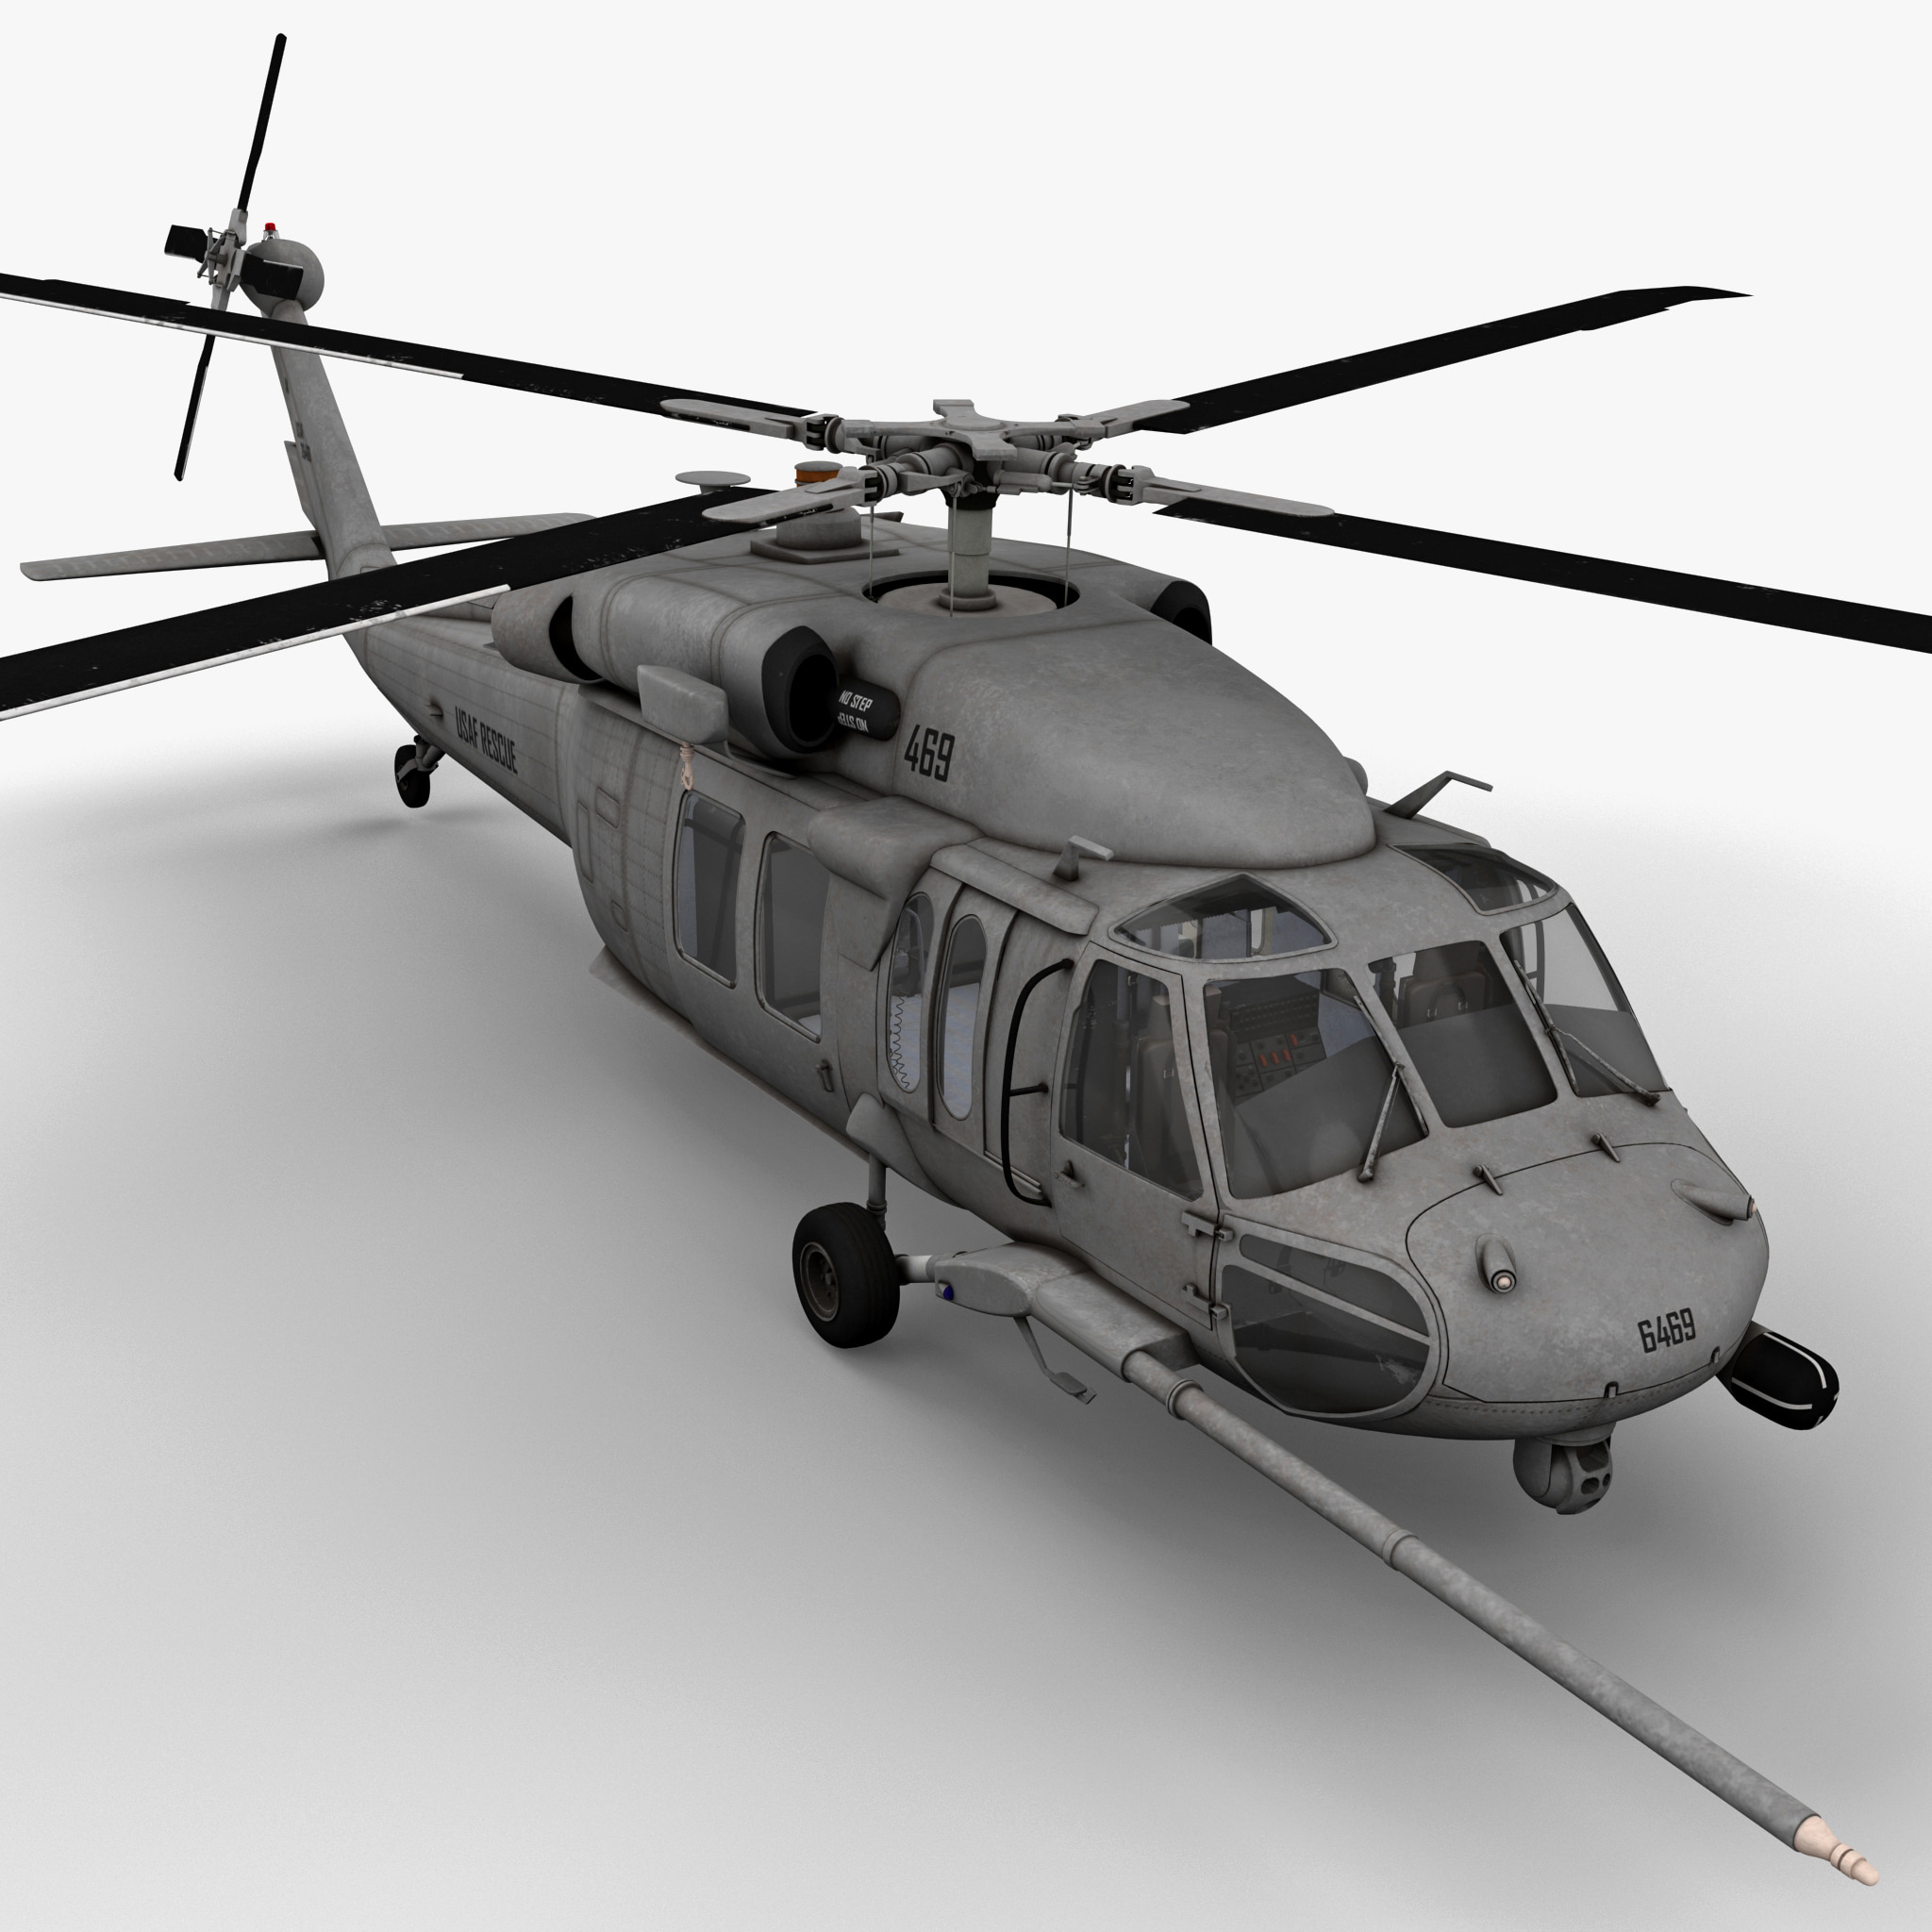 HH-60 Pave Hawk Rigged_2.jpg